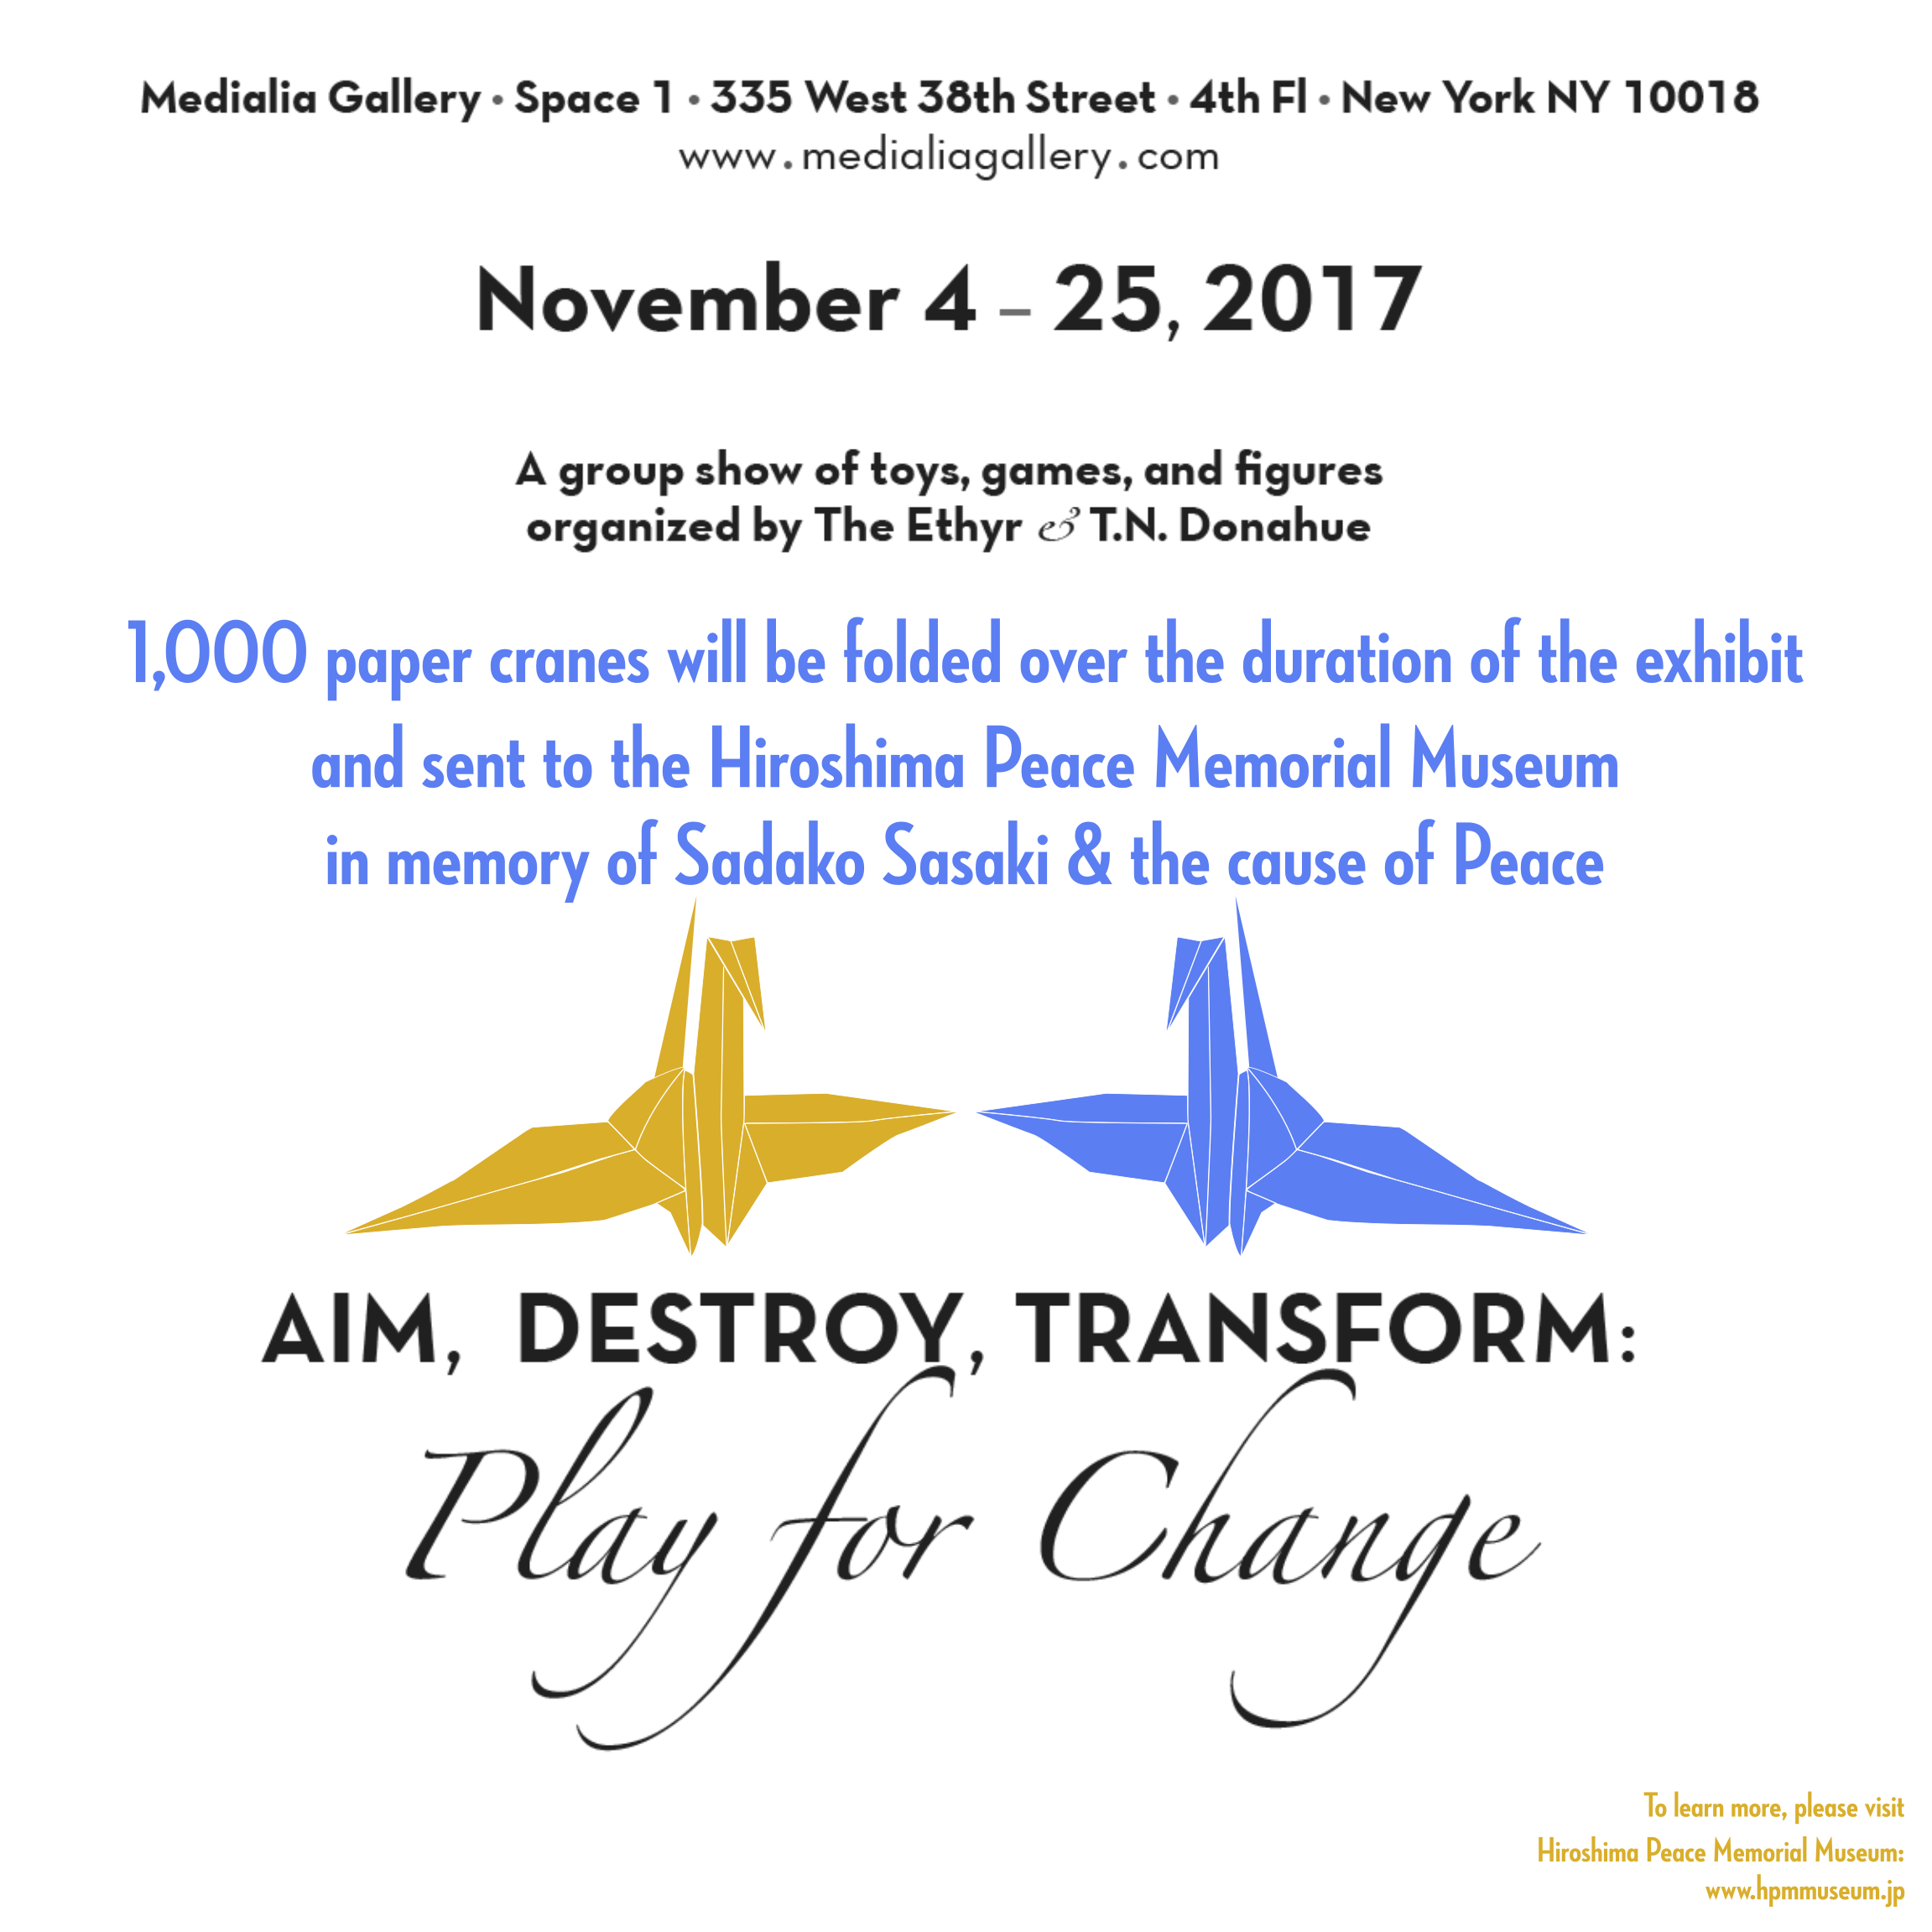 MedialiaGallery_The_Ethyr_AimDestroyTransform_Toy_Show_announcement_PaperCranes_Sadako_Sasaki_November_2017.jpg.png